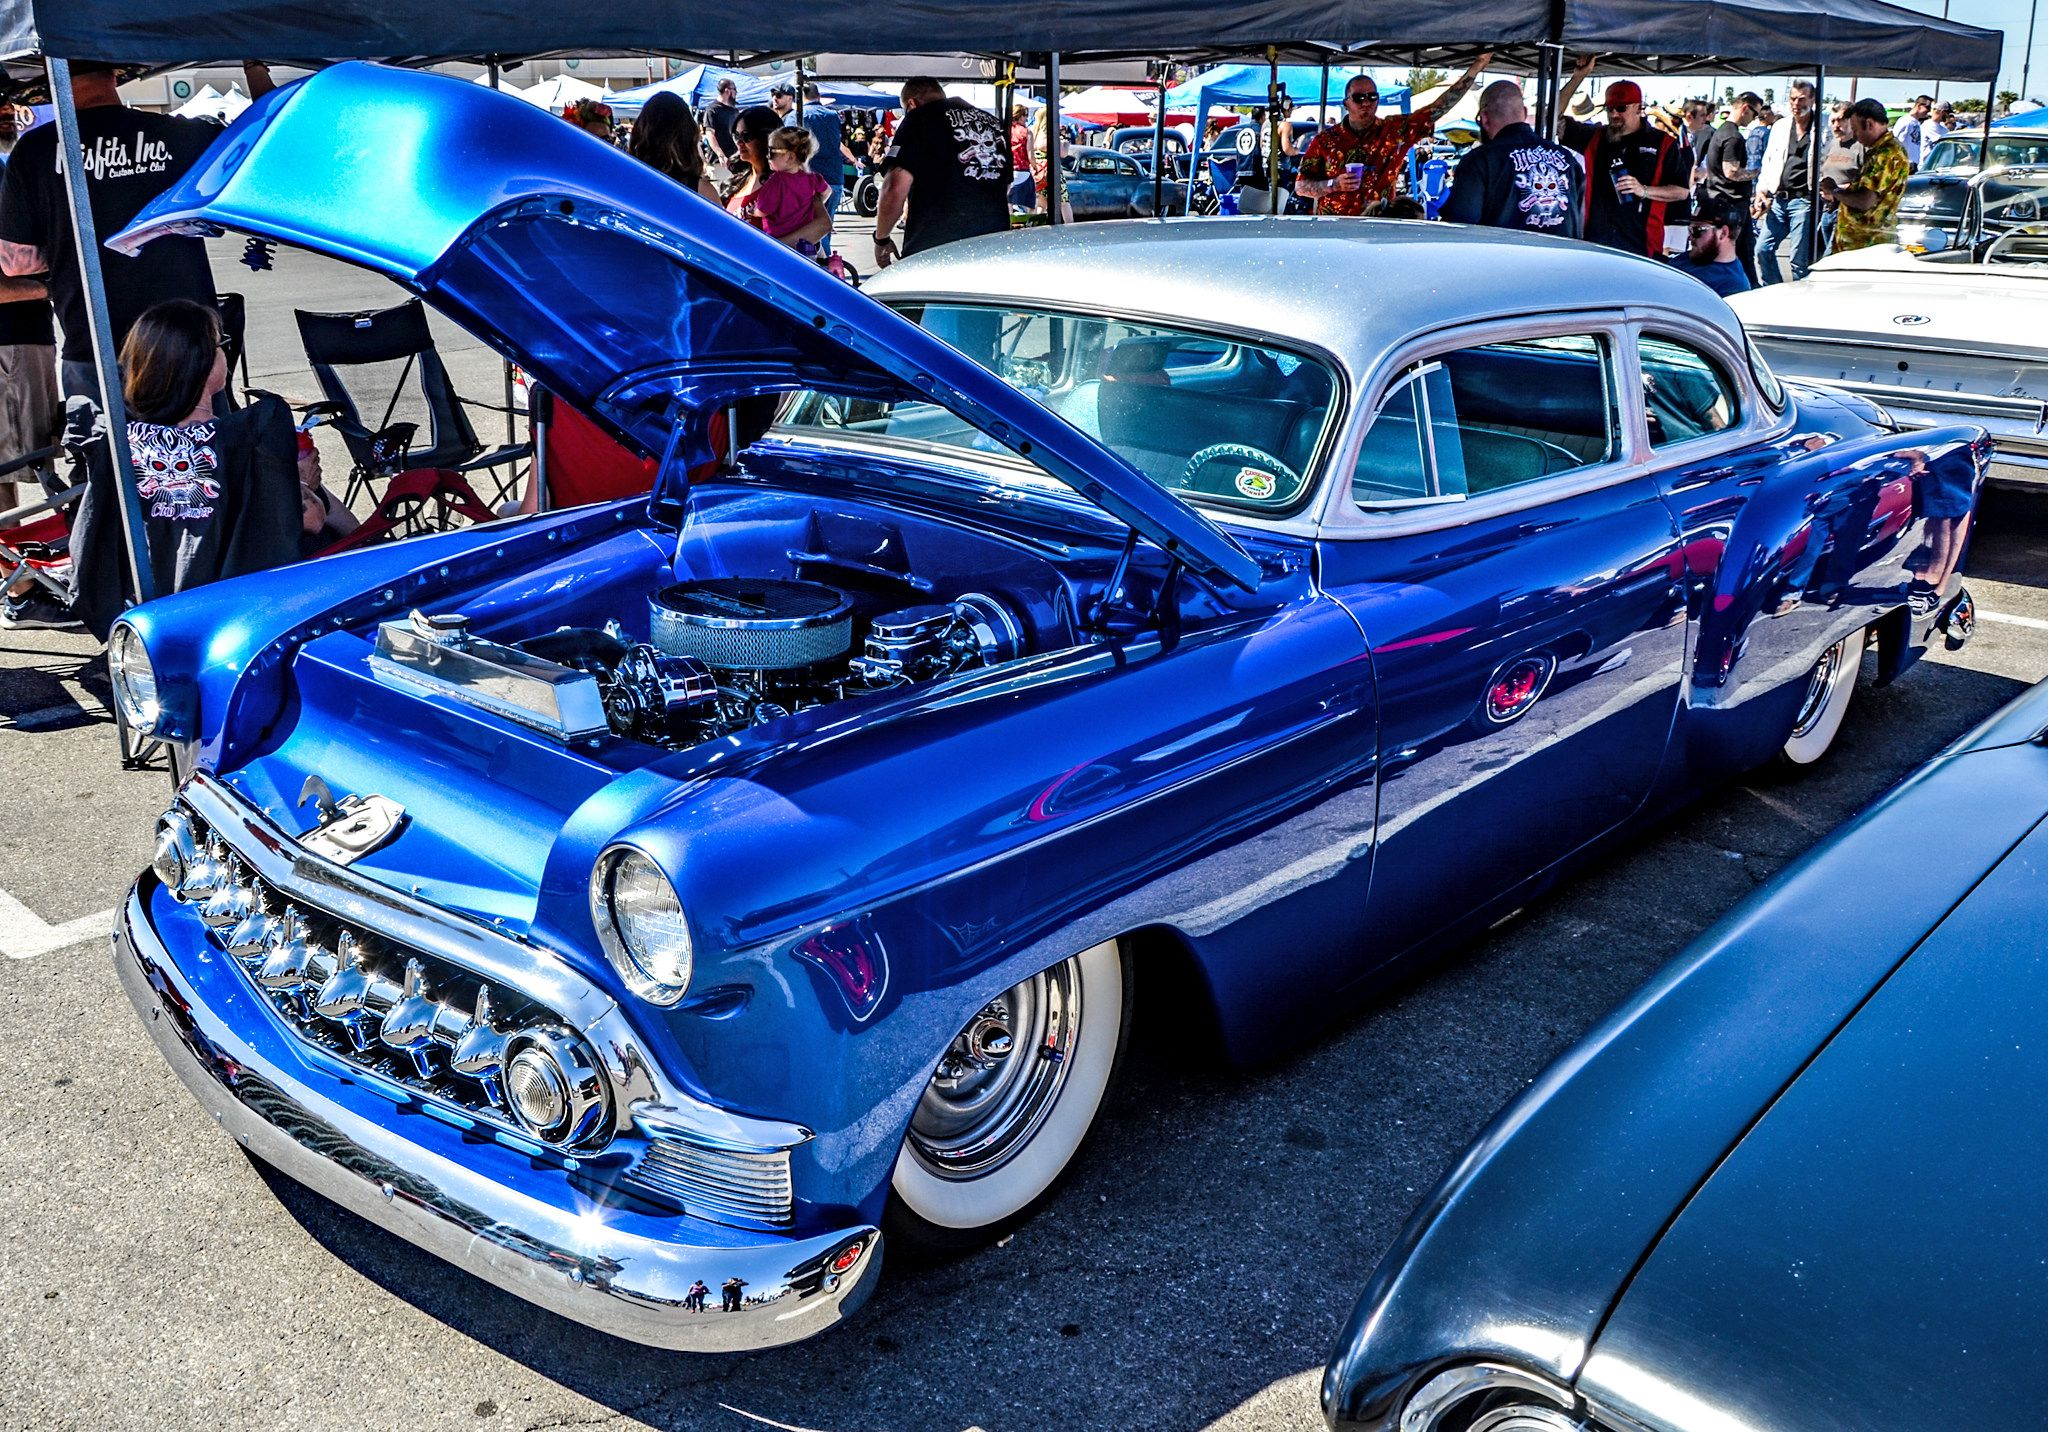 Viva Las Vegas Rockabilly Hot Rodder Car Show TDelCoro Plane - Car show in vegas 2018